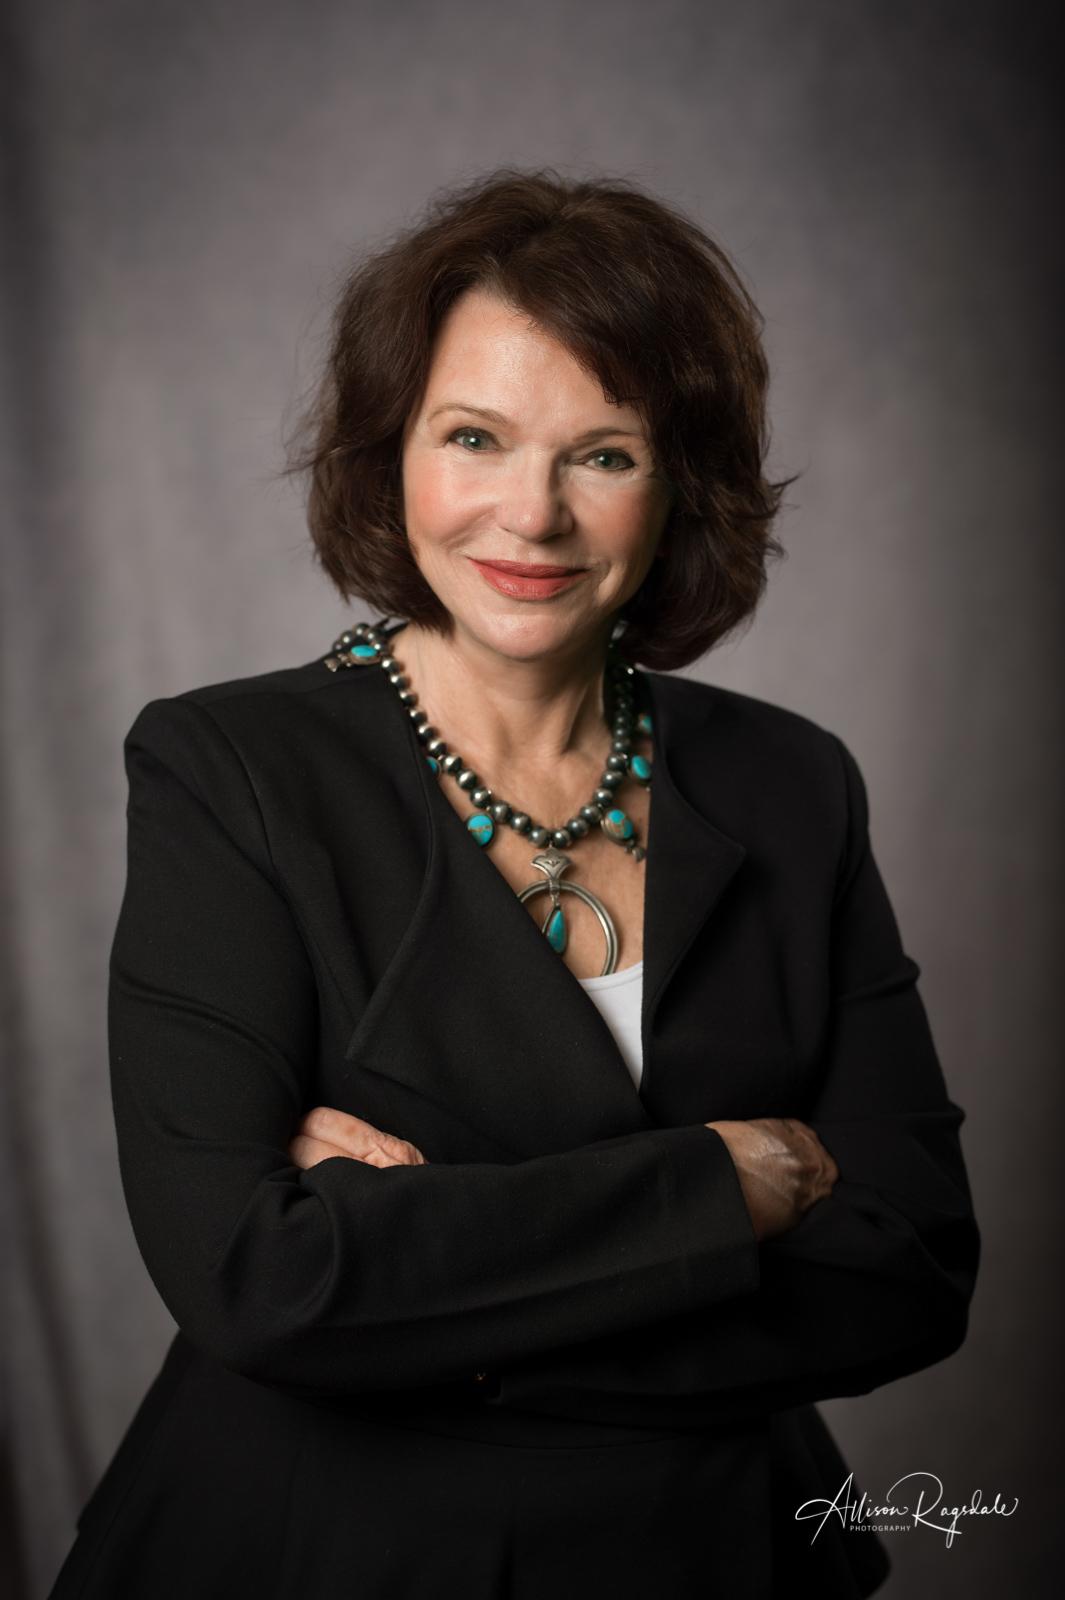 Lesley Gannon Meiering's Headshots - Durango, CO